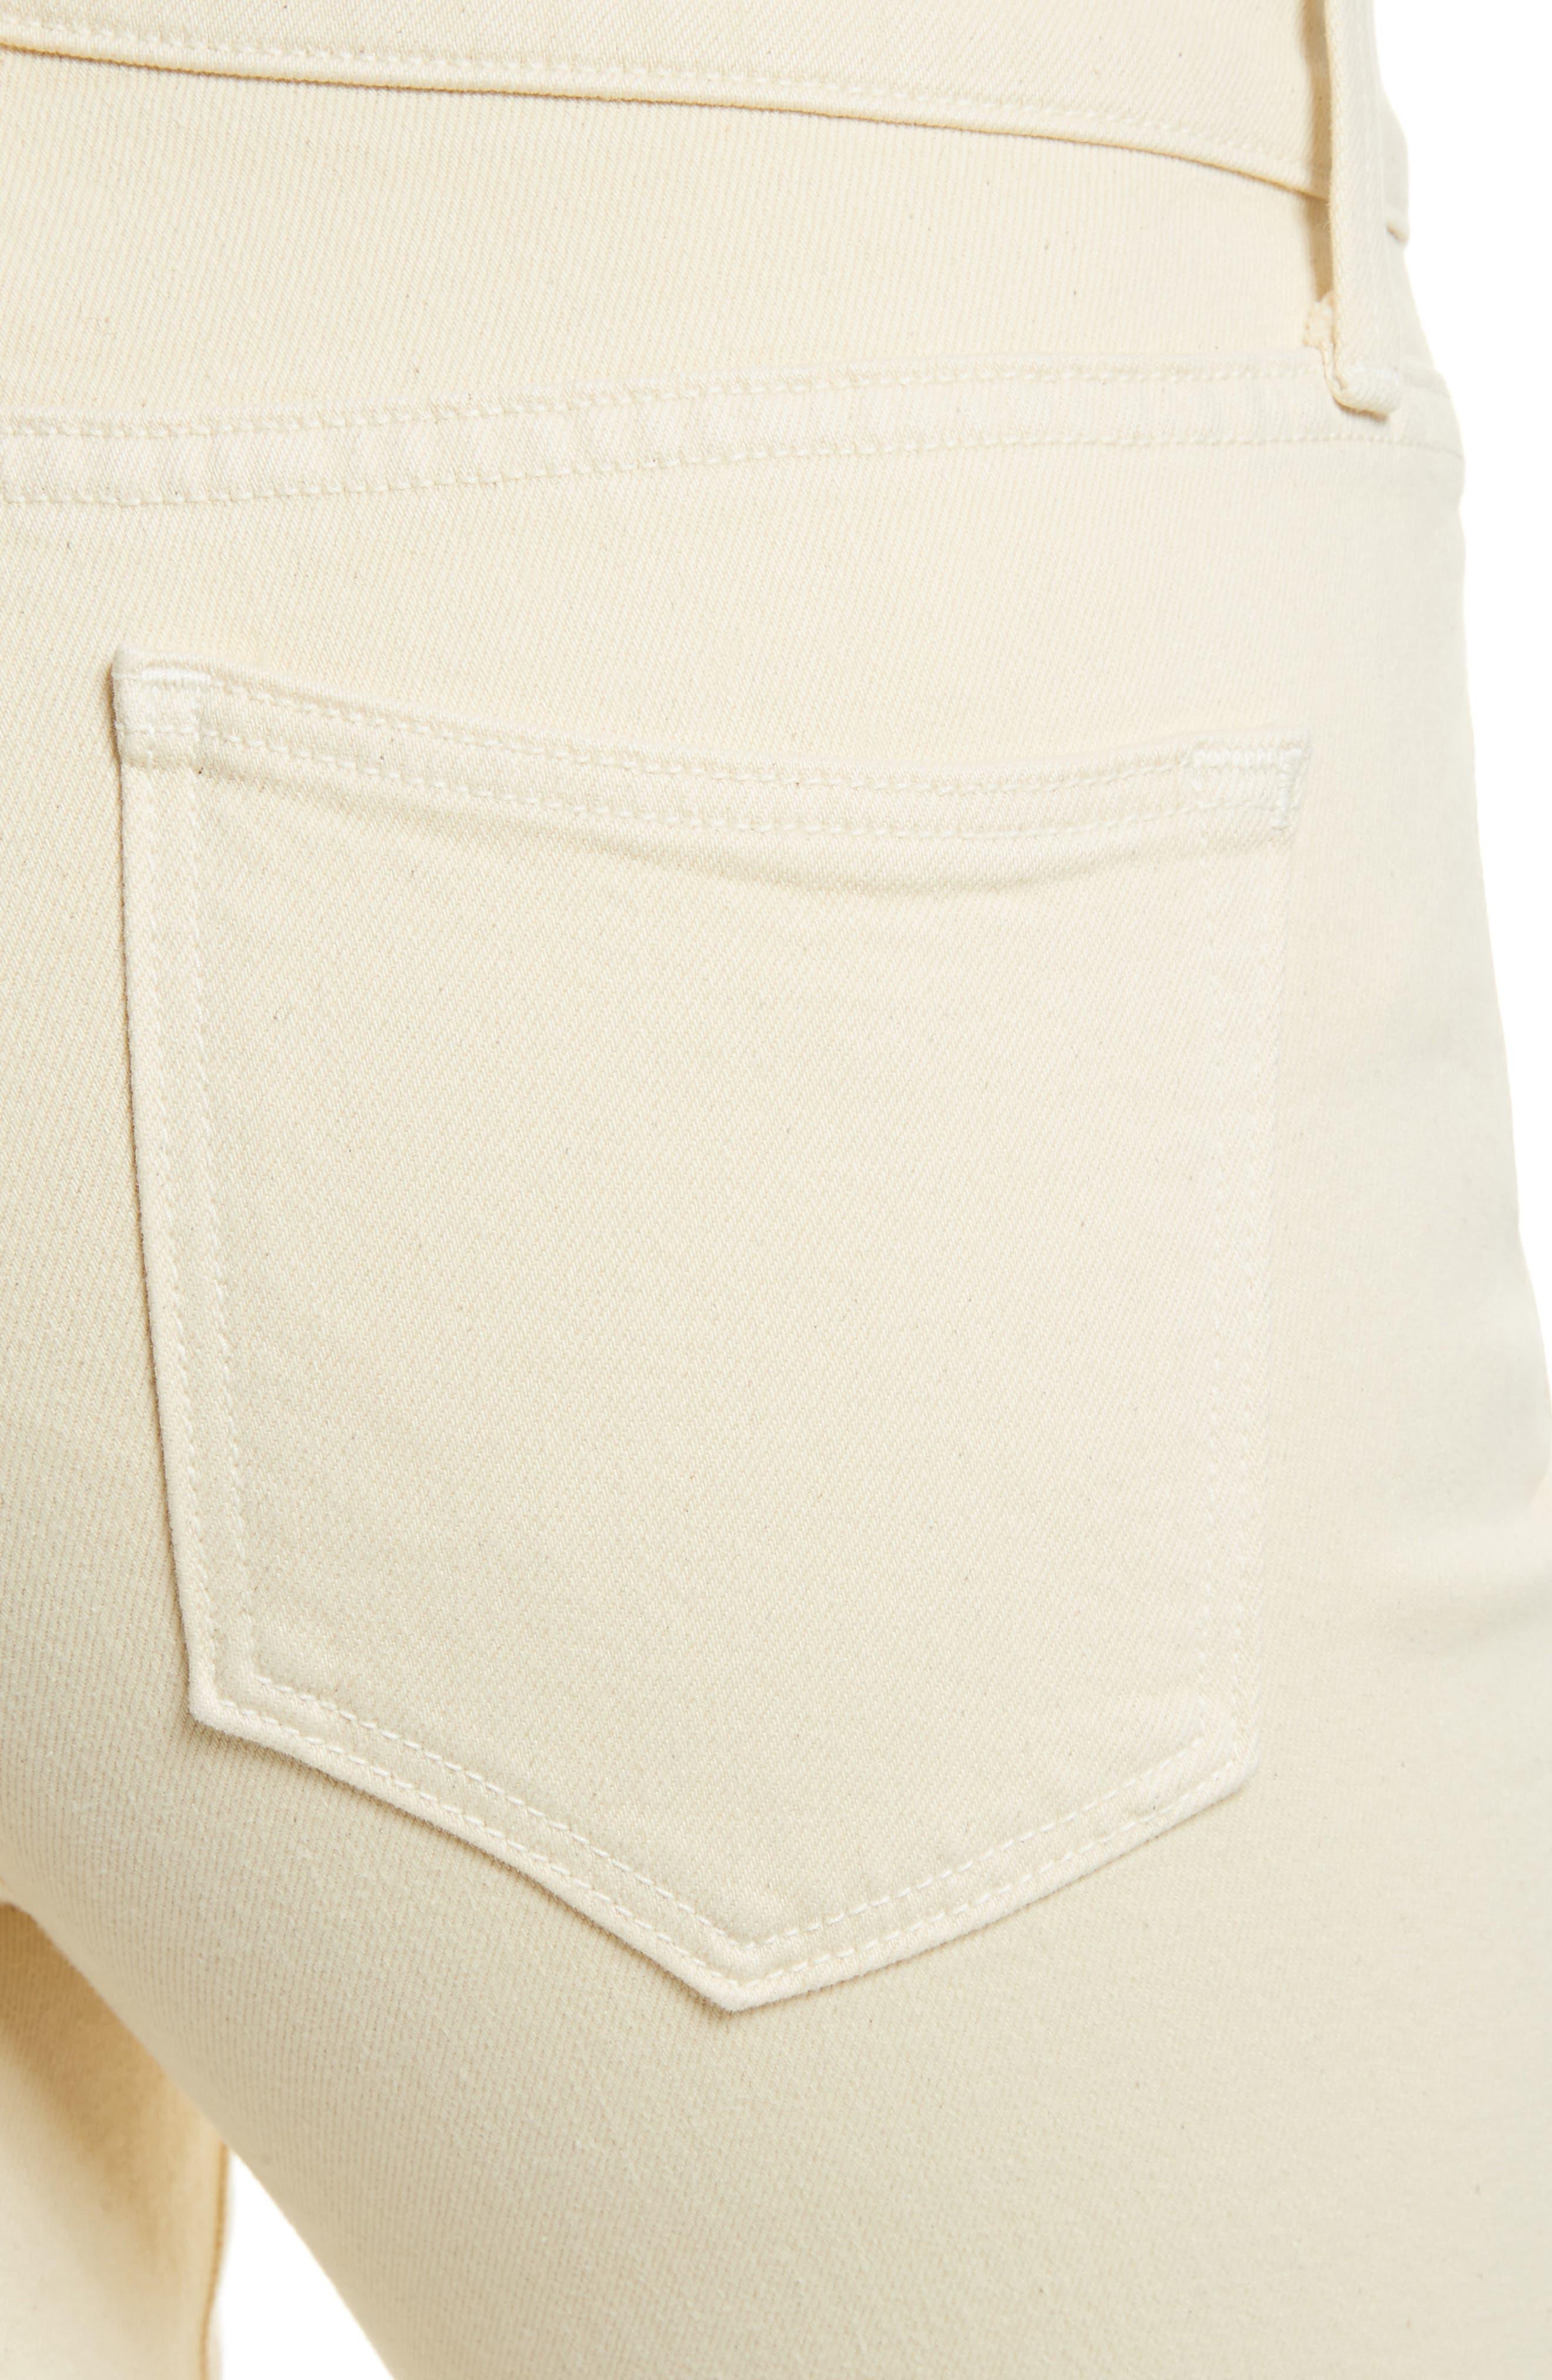 Skinny Crop Jeans,                             Alternate thumbnail 17, color,